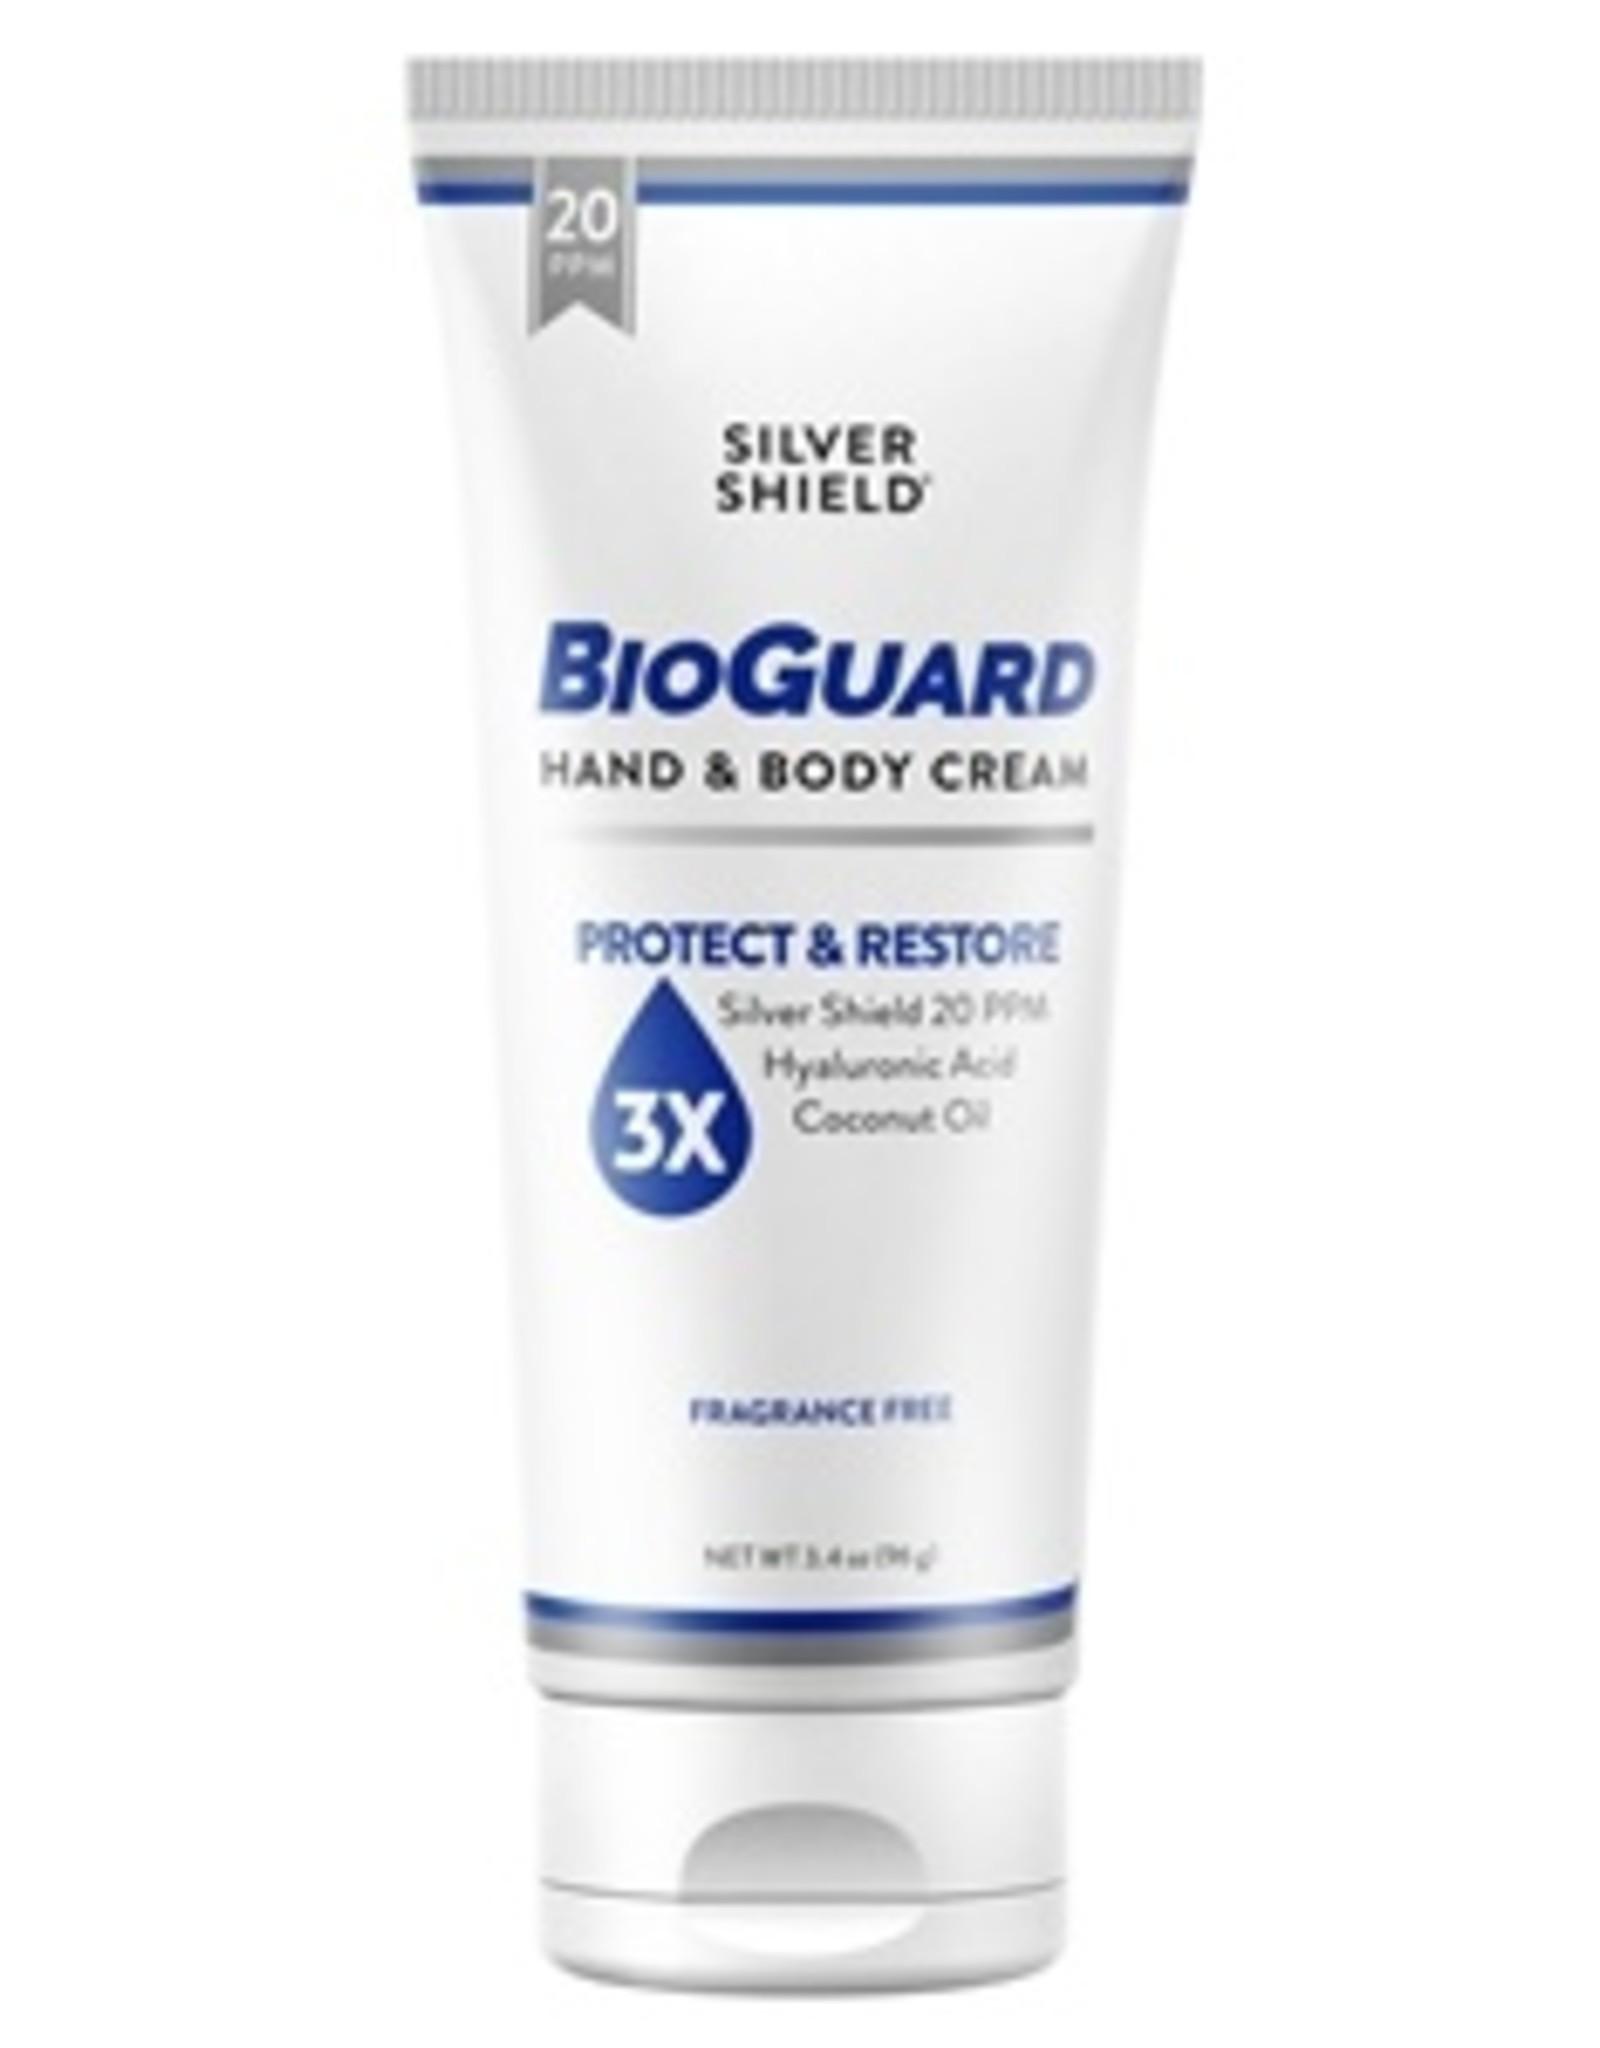 Nature's Sunshine Silver Shield Bioguard Hand & Body Cream 3.4oz